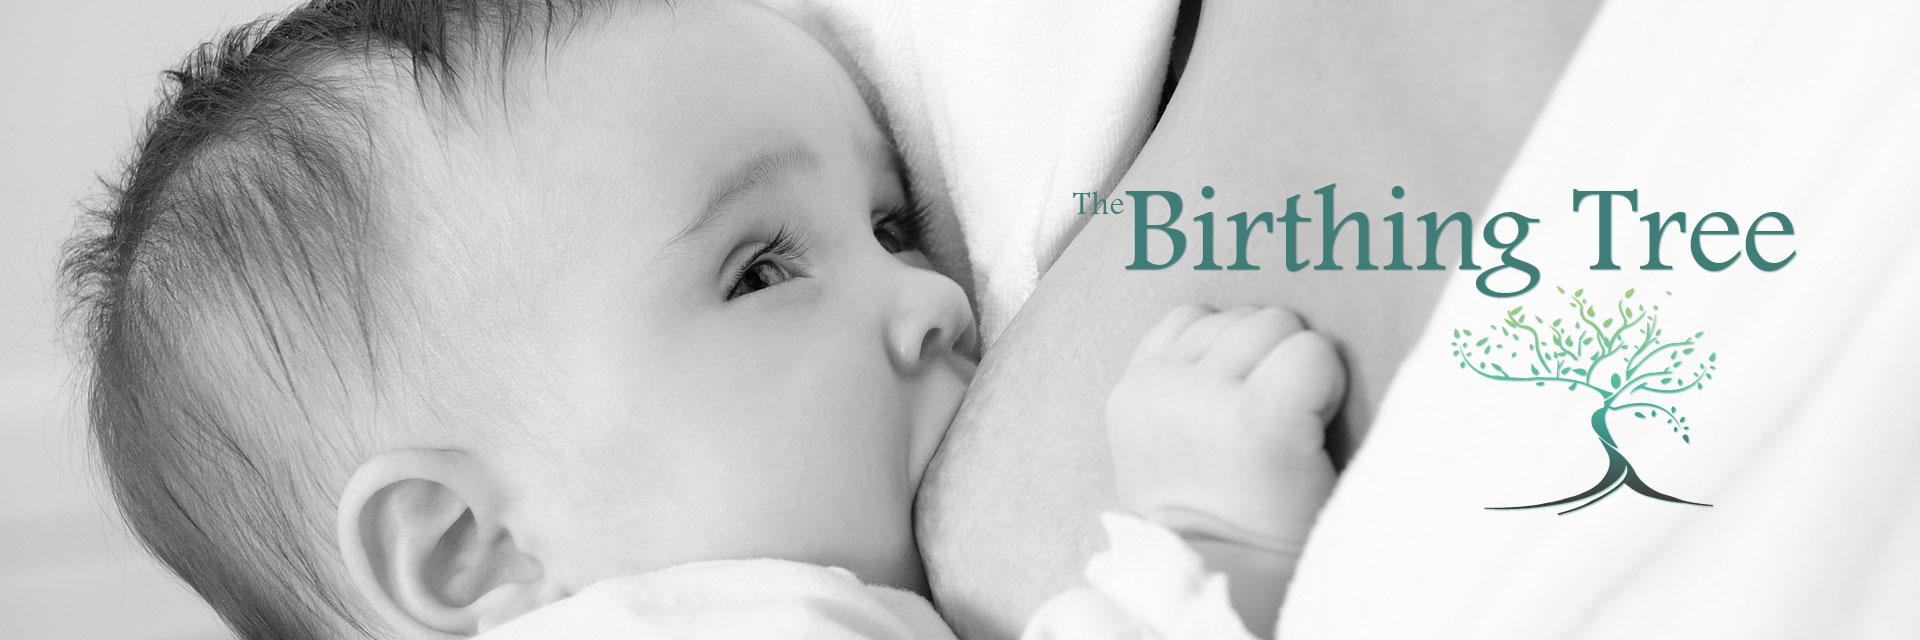 The Birthing Tree